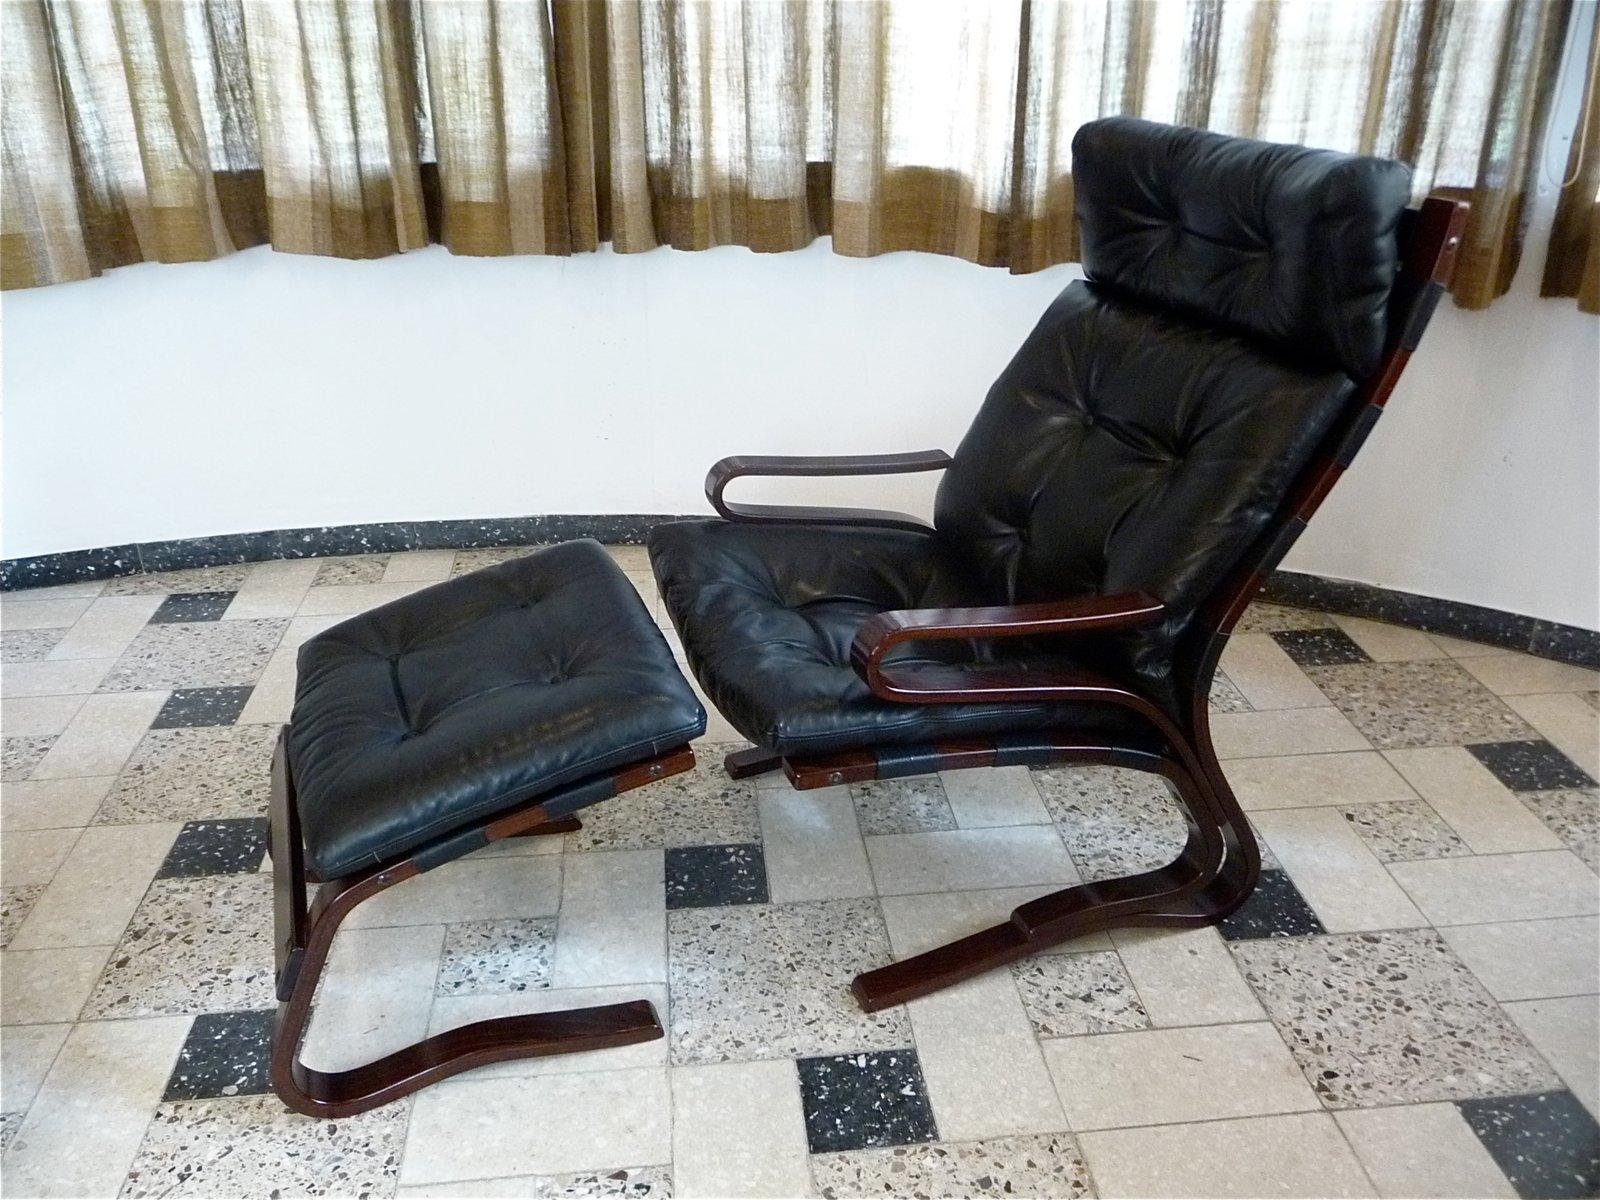 Kengu Leather Lounge Chair Foot Stool By Elsa Nordahl Solheim For Oddvin Rykken 1960s For